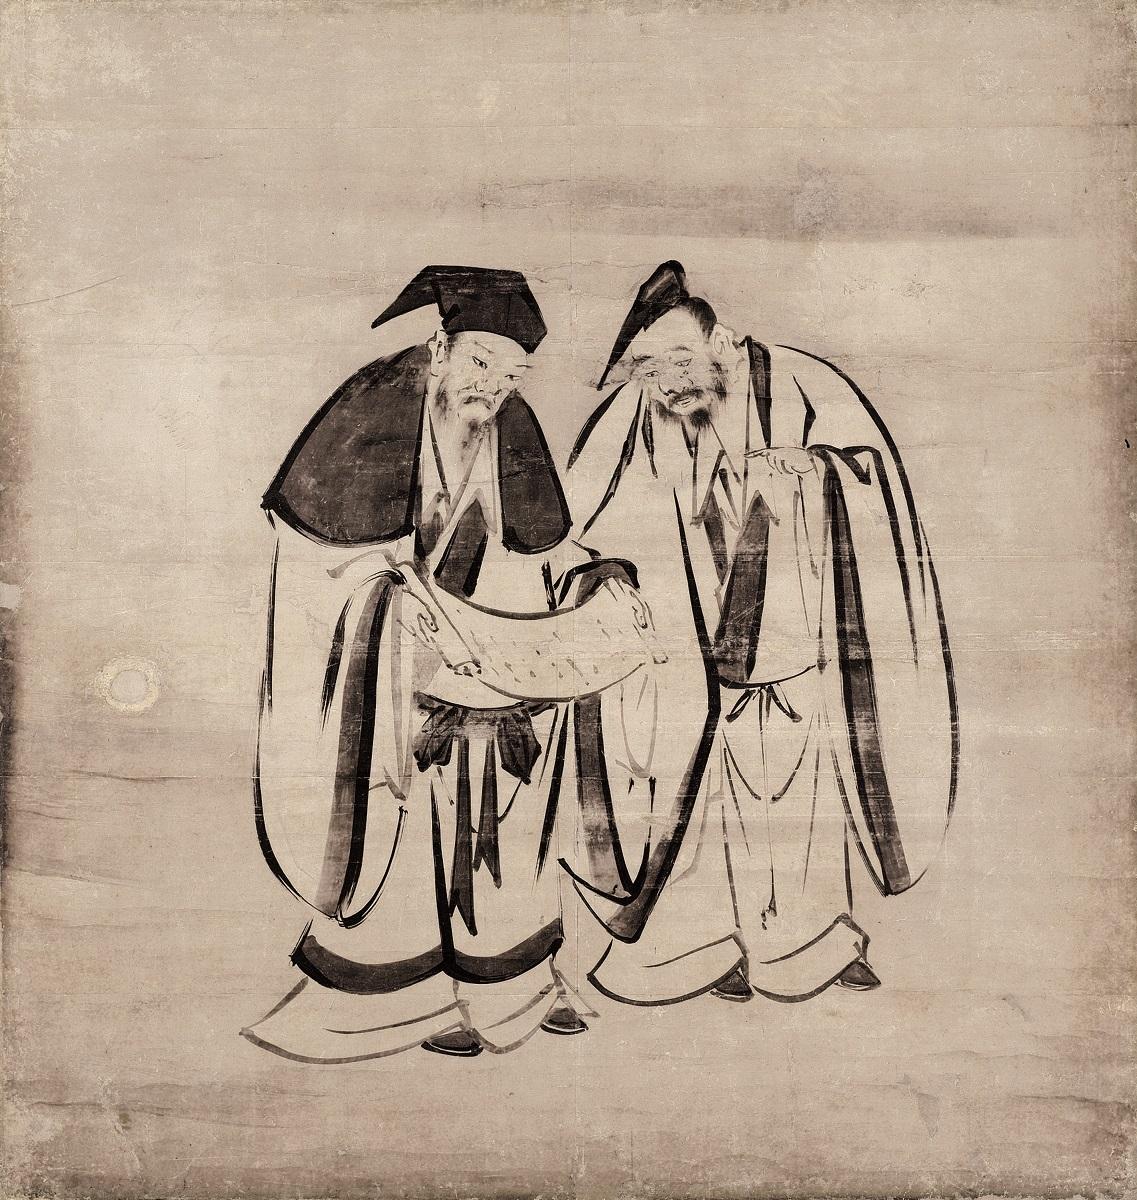 重要文化財 竹林七賢図(左隻) 海北友松筆 建仁寺(京都) 慶長4年(1599) 通期展示(ただしこの場面は前期展示、4/11~4/30)